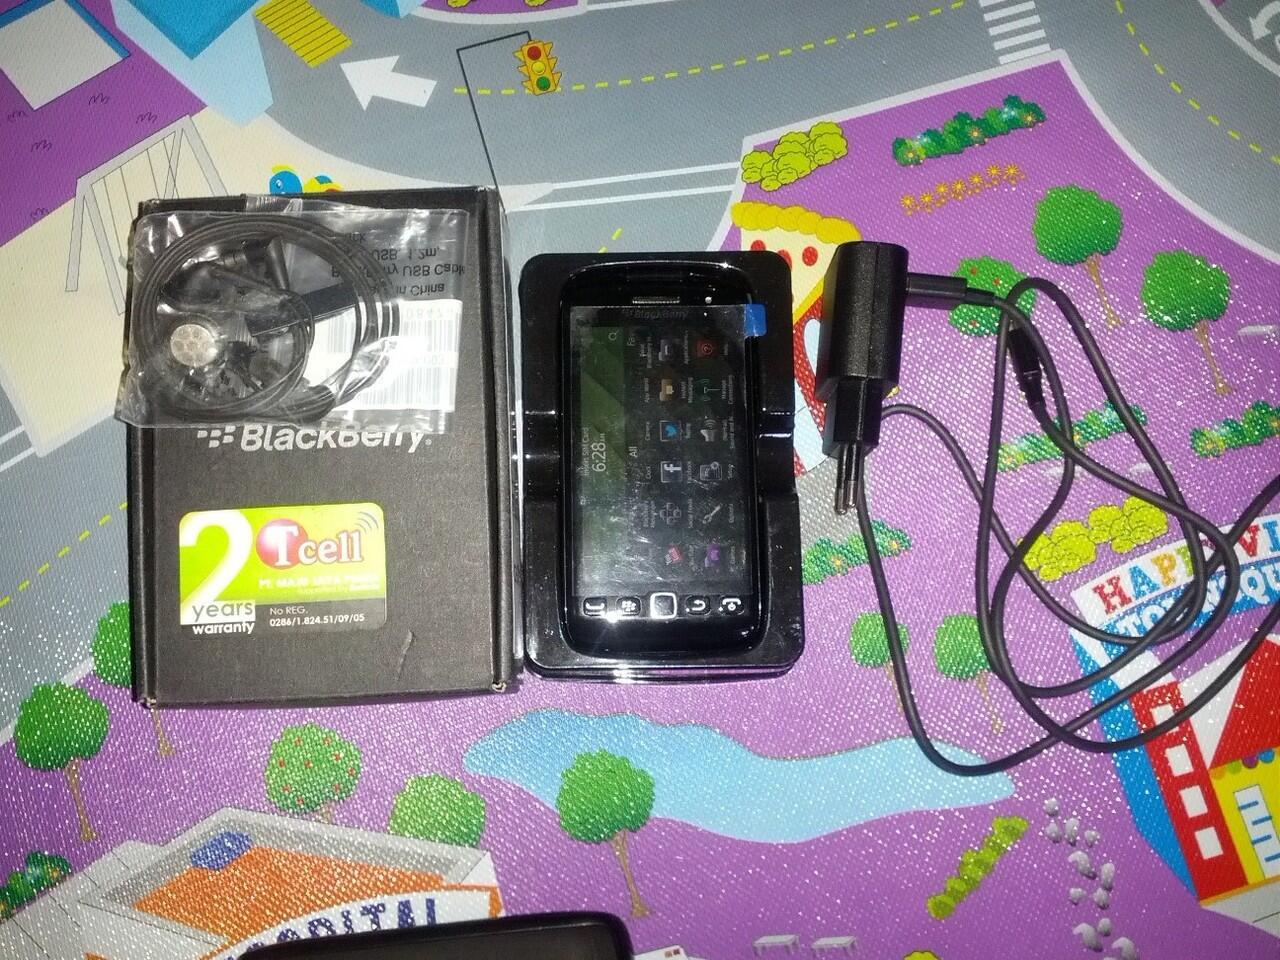 Blackberry Torch 9860 Monza Harga 2.000.000